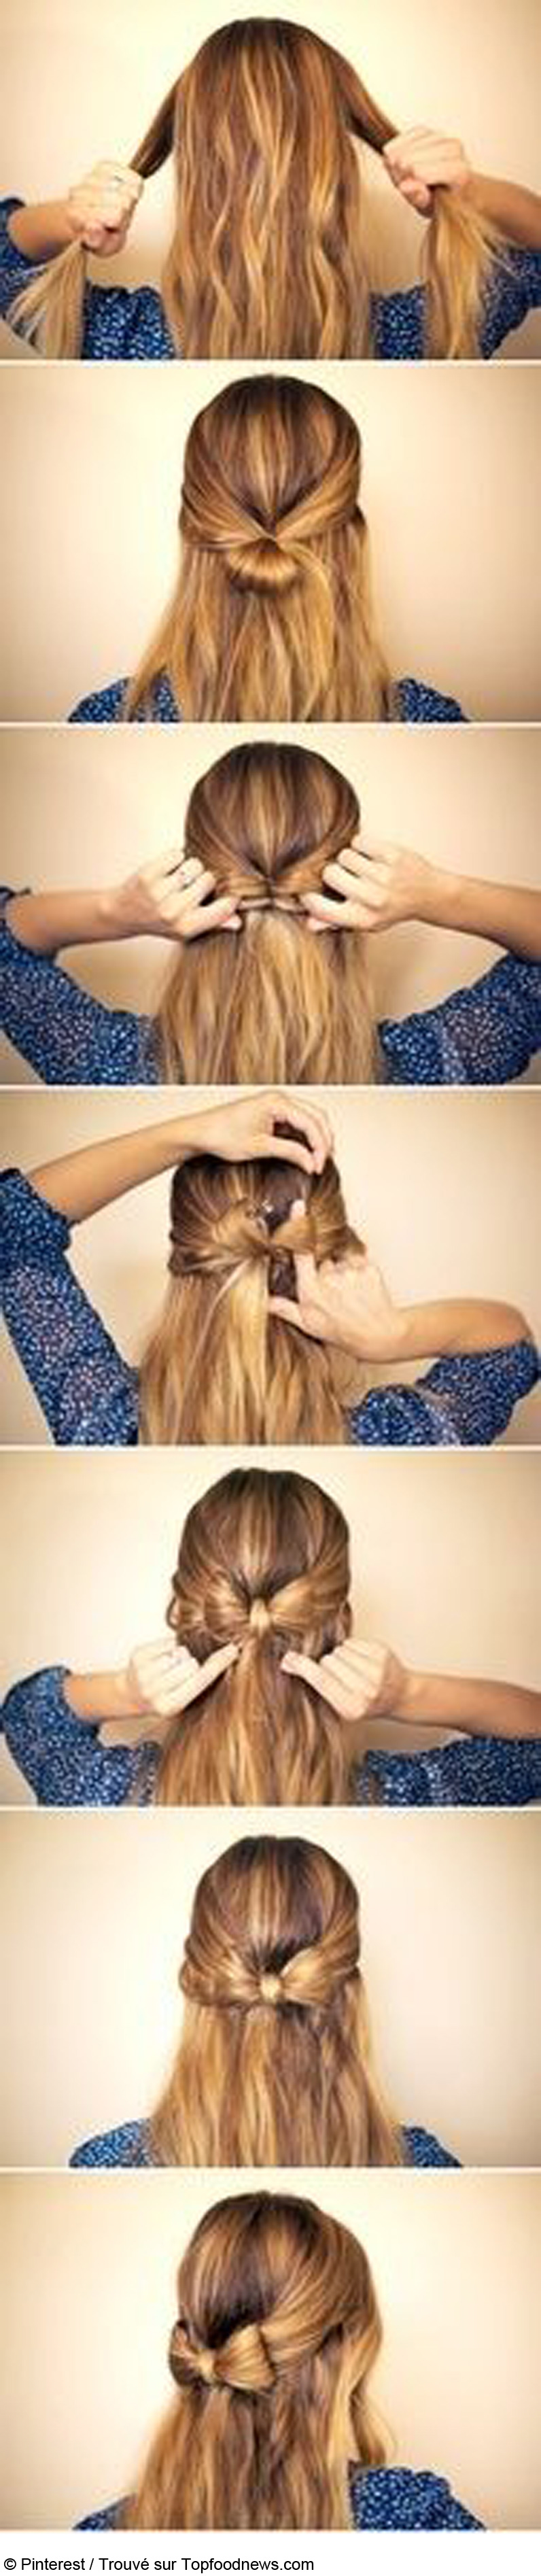 Idee coiffure express.jpg